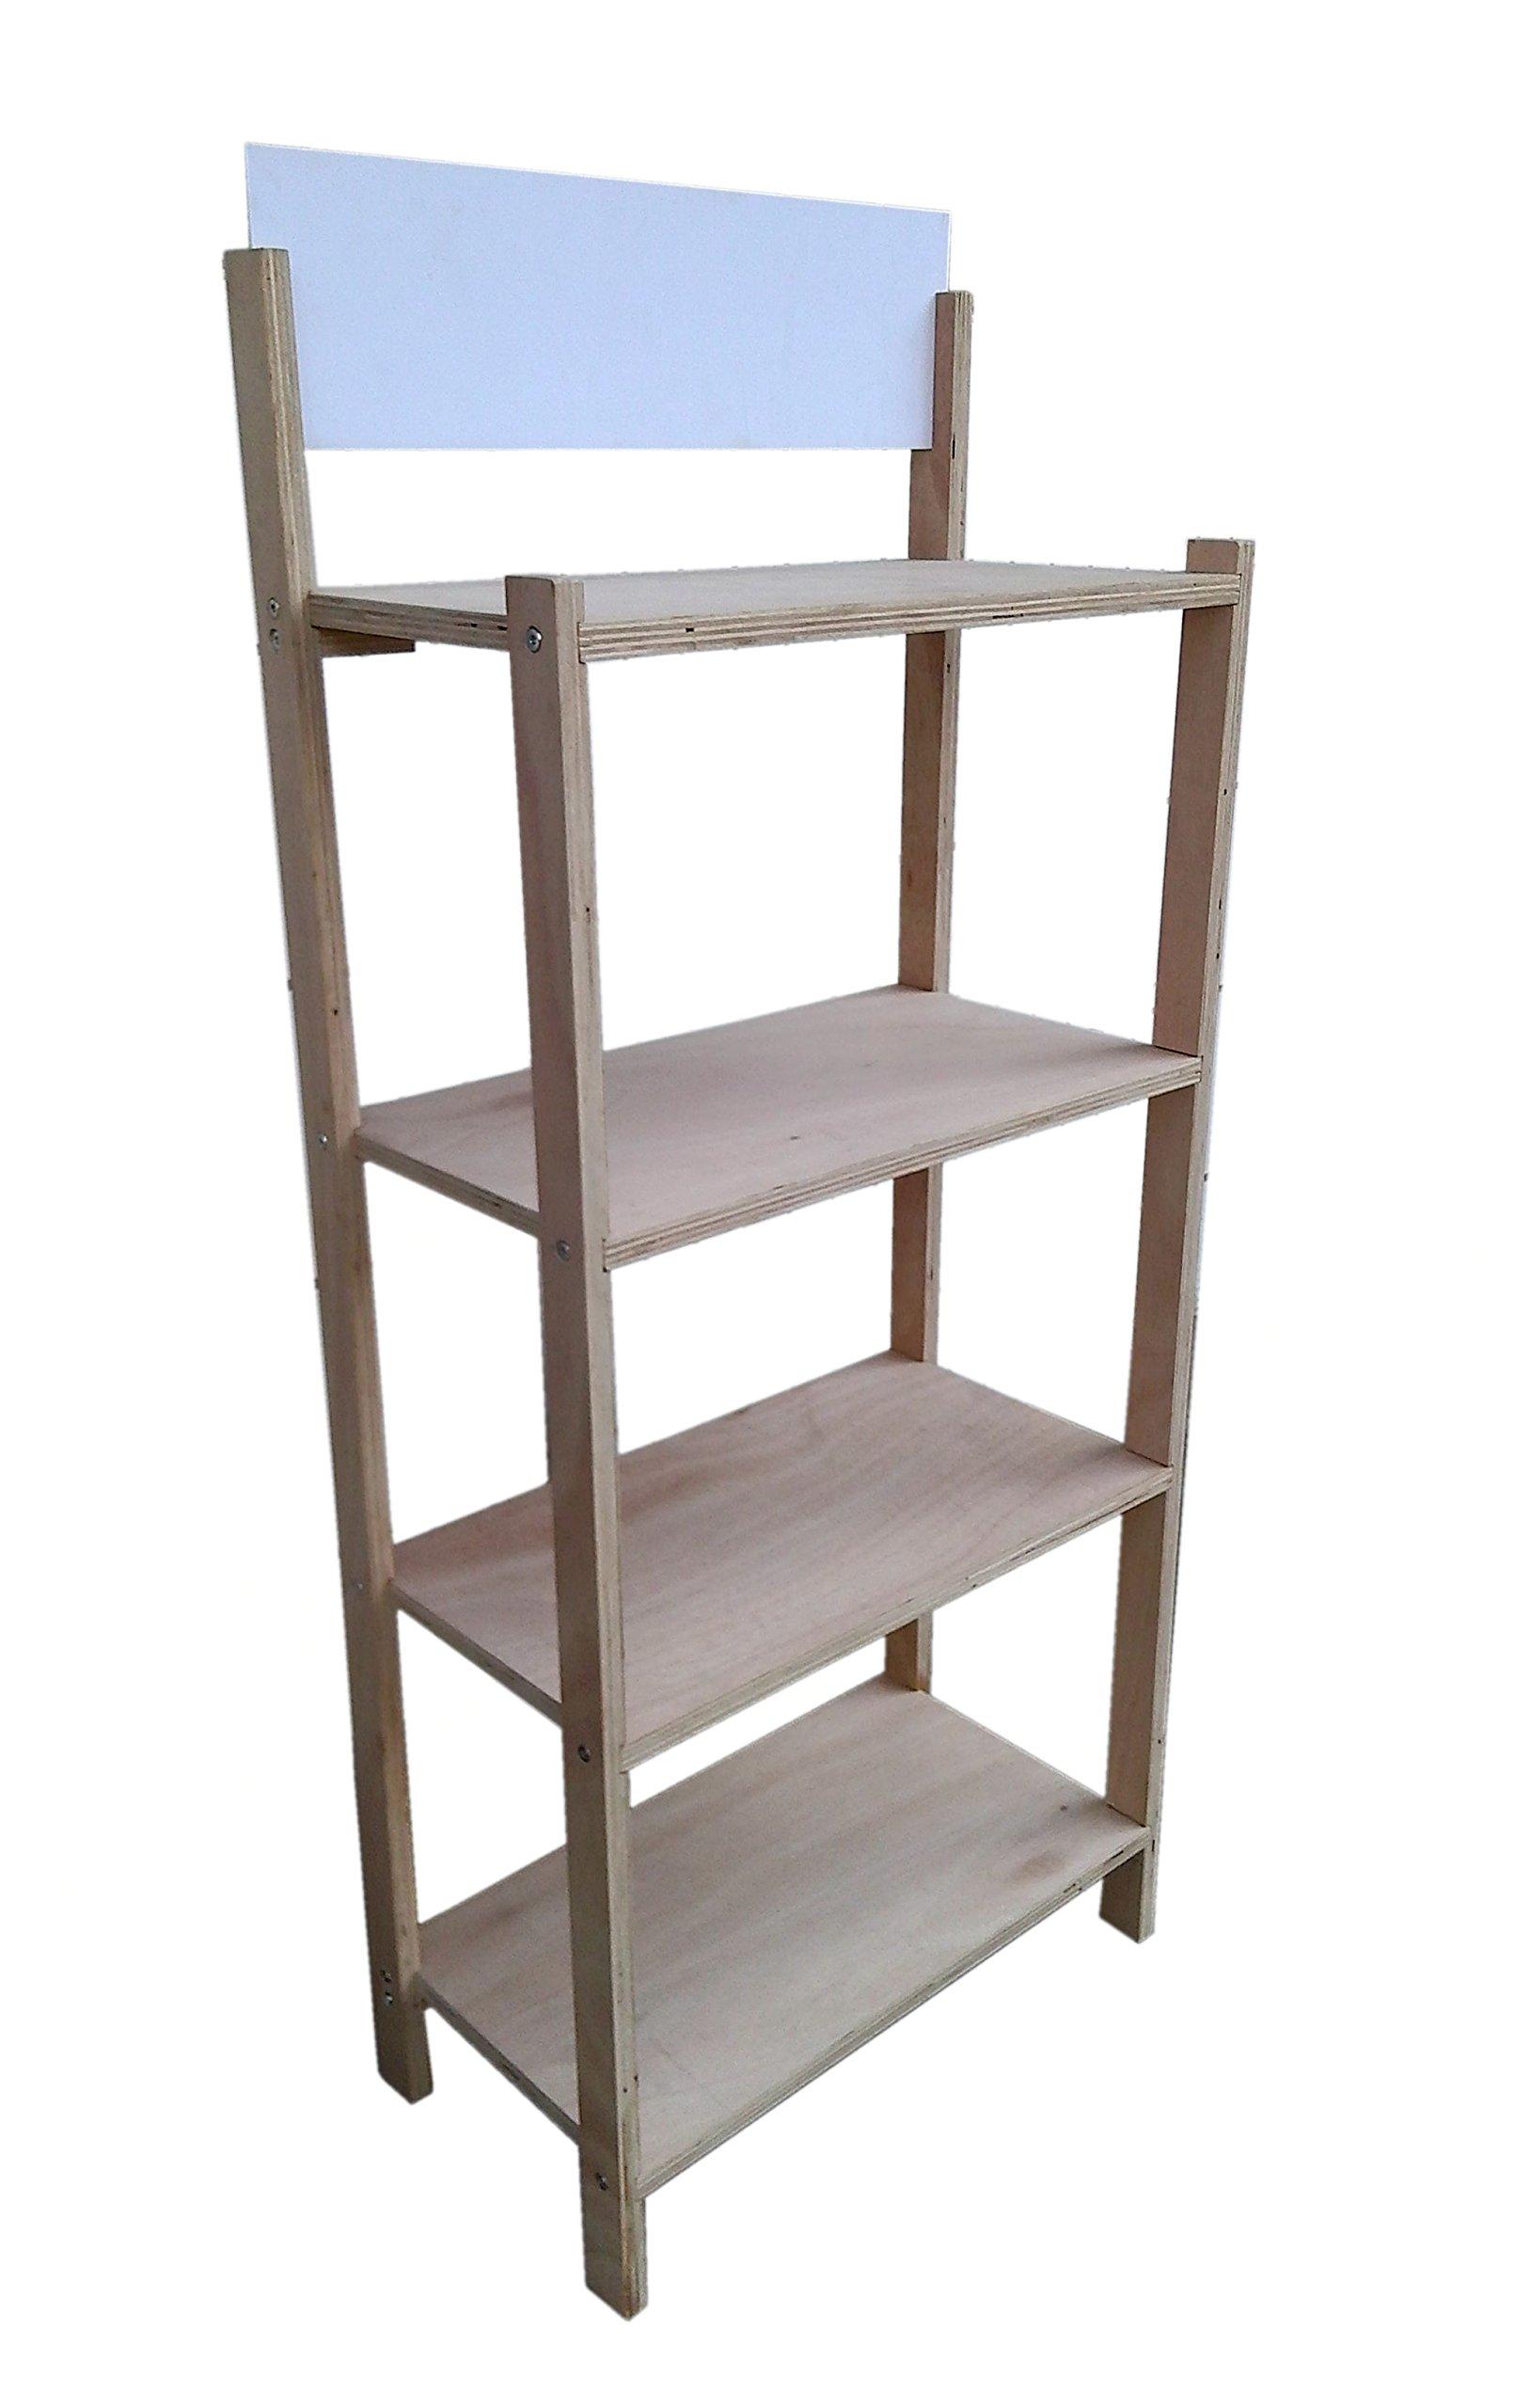 FixtureDisplays 4-Tier Foldable Wood Rack Display for Beverage Fruit Merchandise W/Sign Board 15904